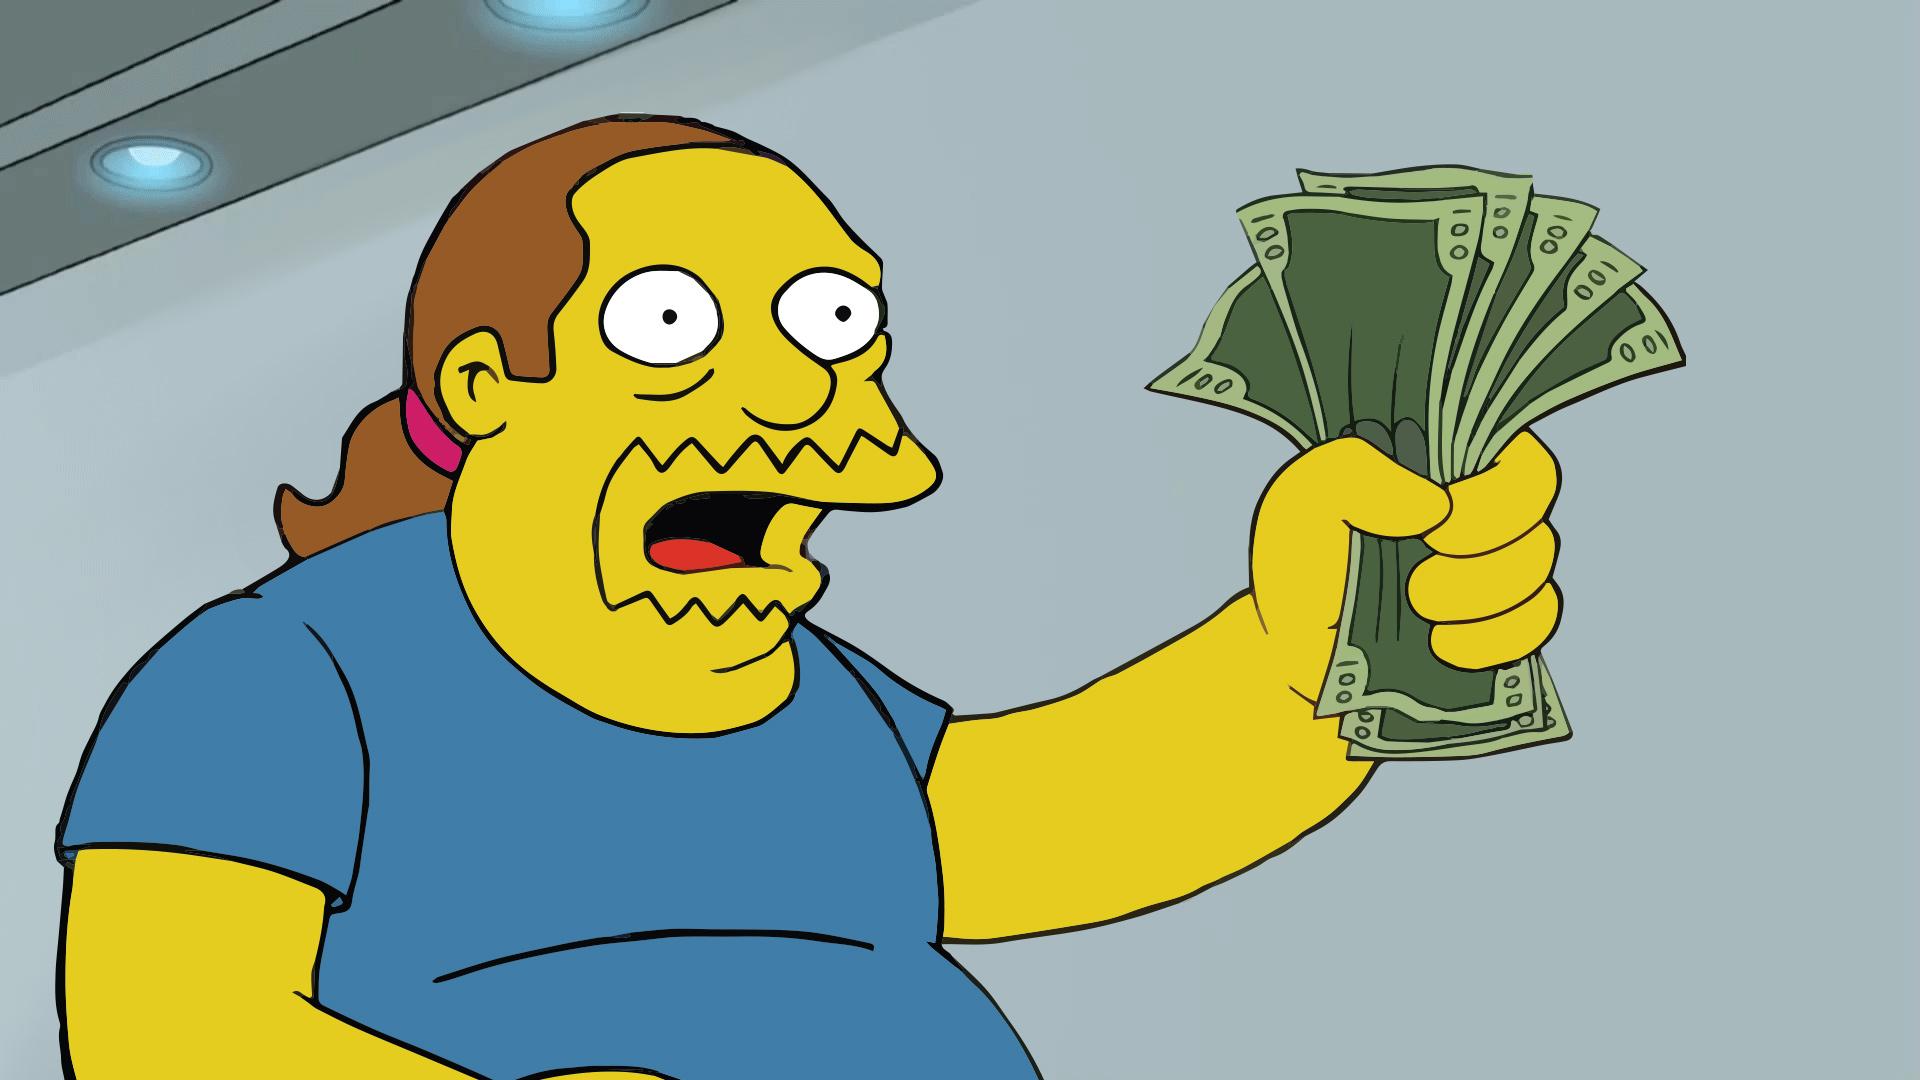 bda547c96fa High Quality Comic Book Guy take my money Blank Meme Template